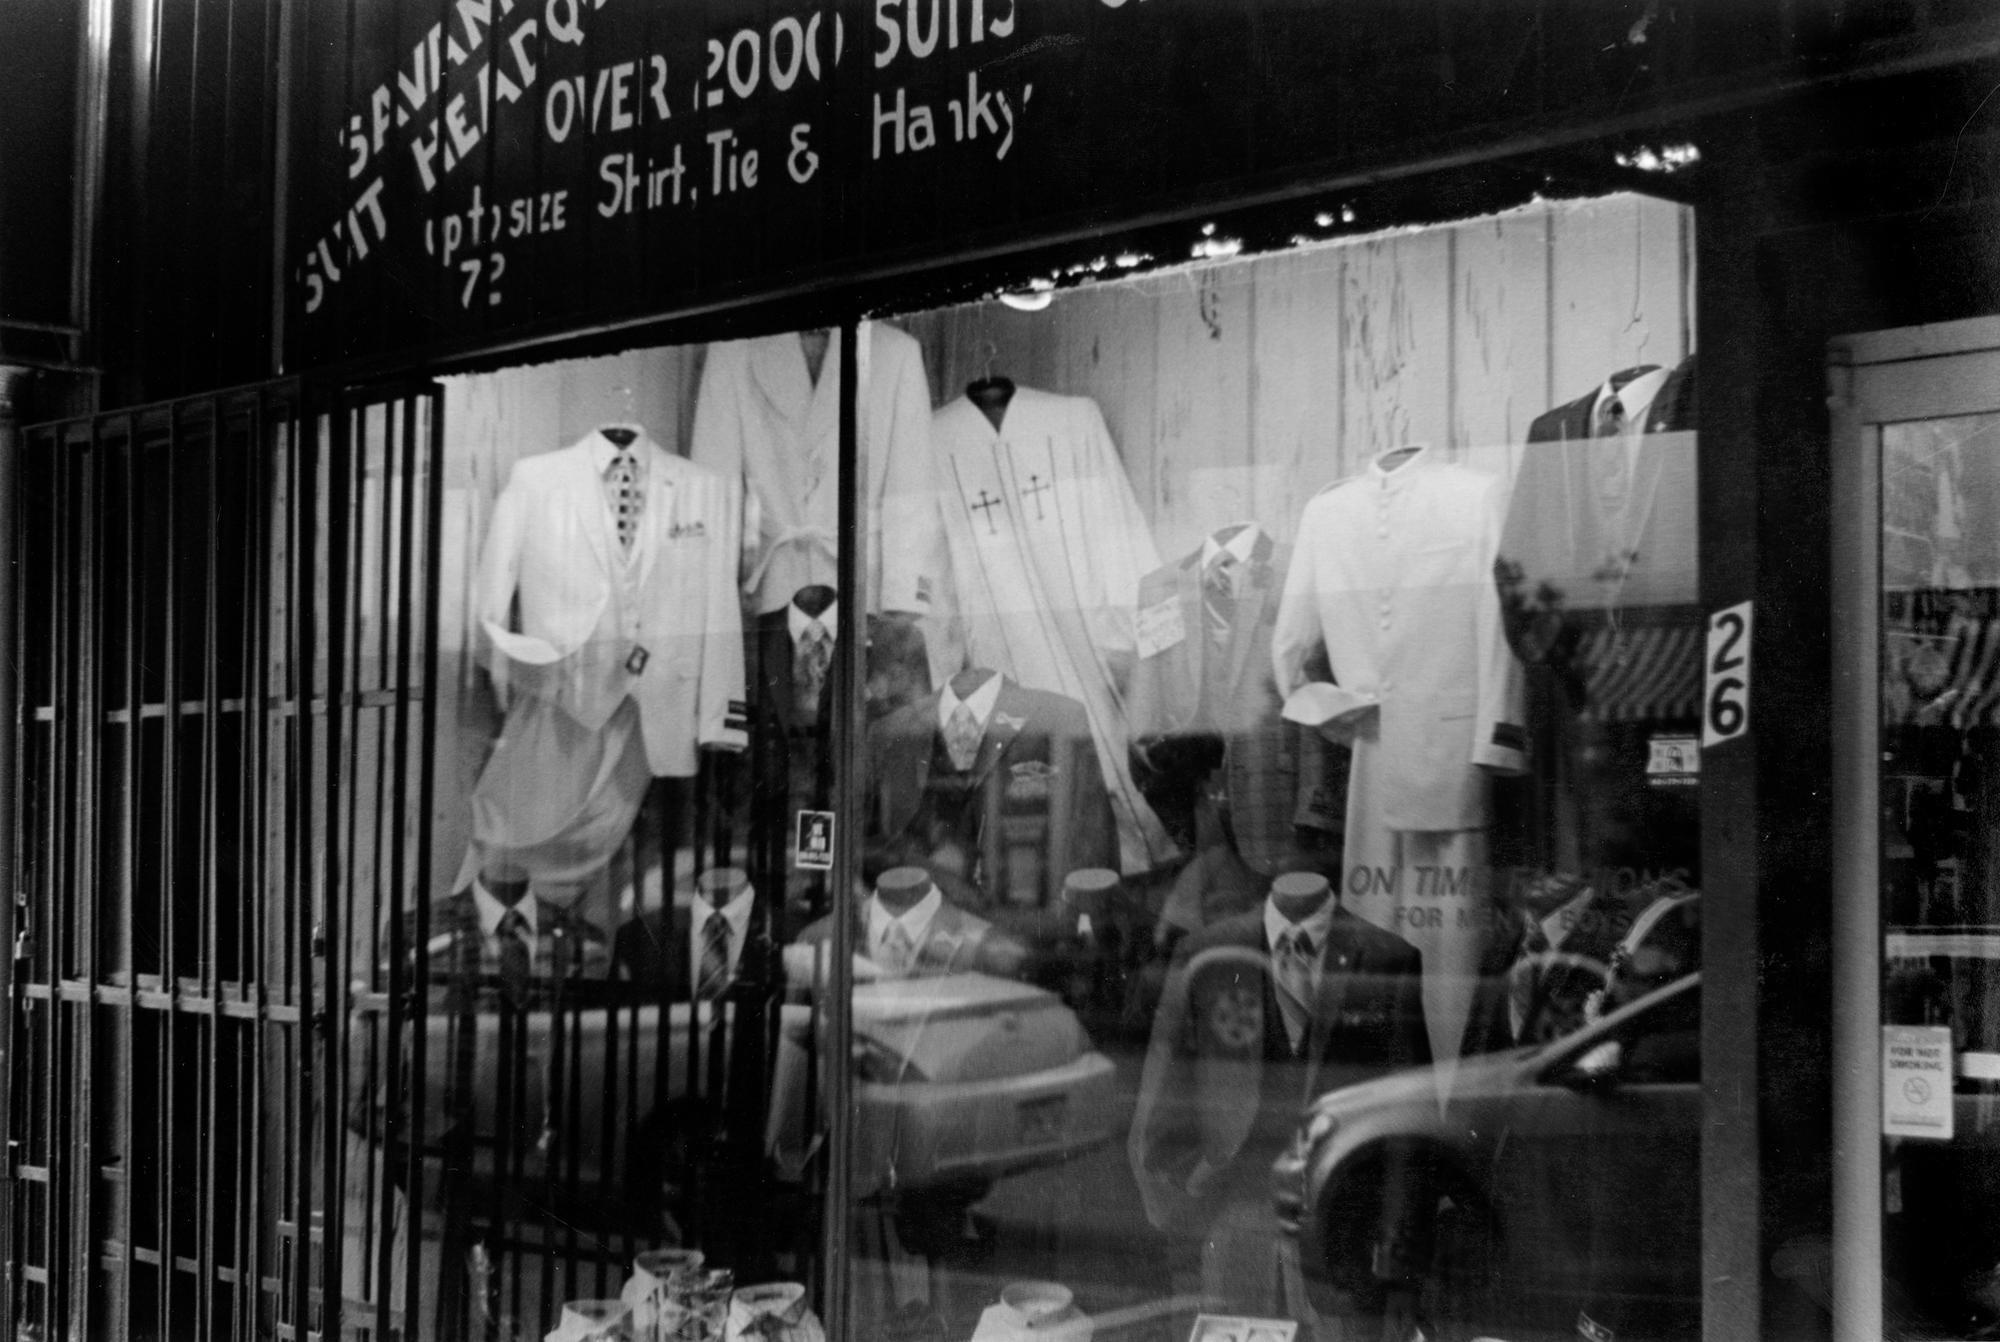 Penelope_Stone-Window_Shopping-11.jpg